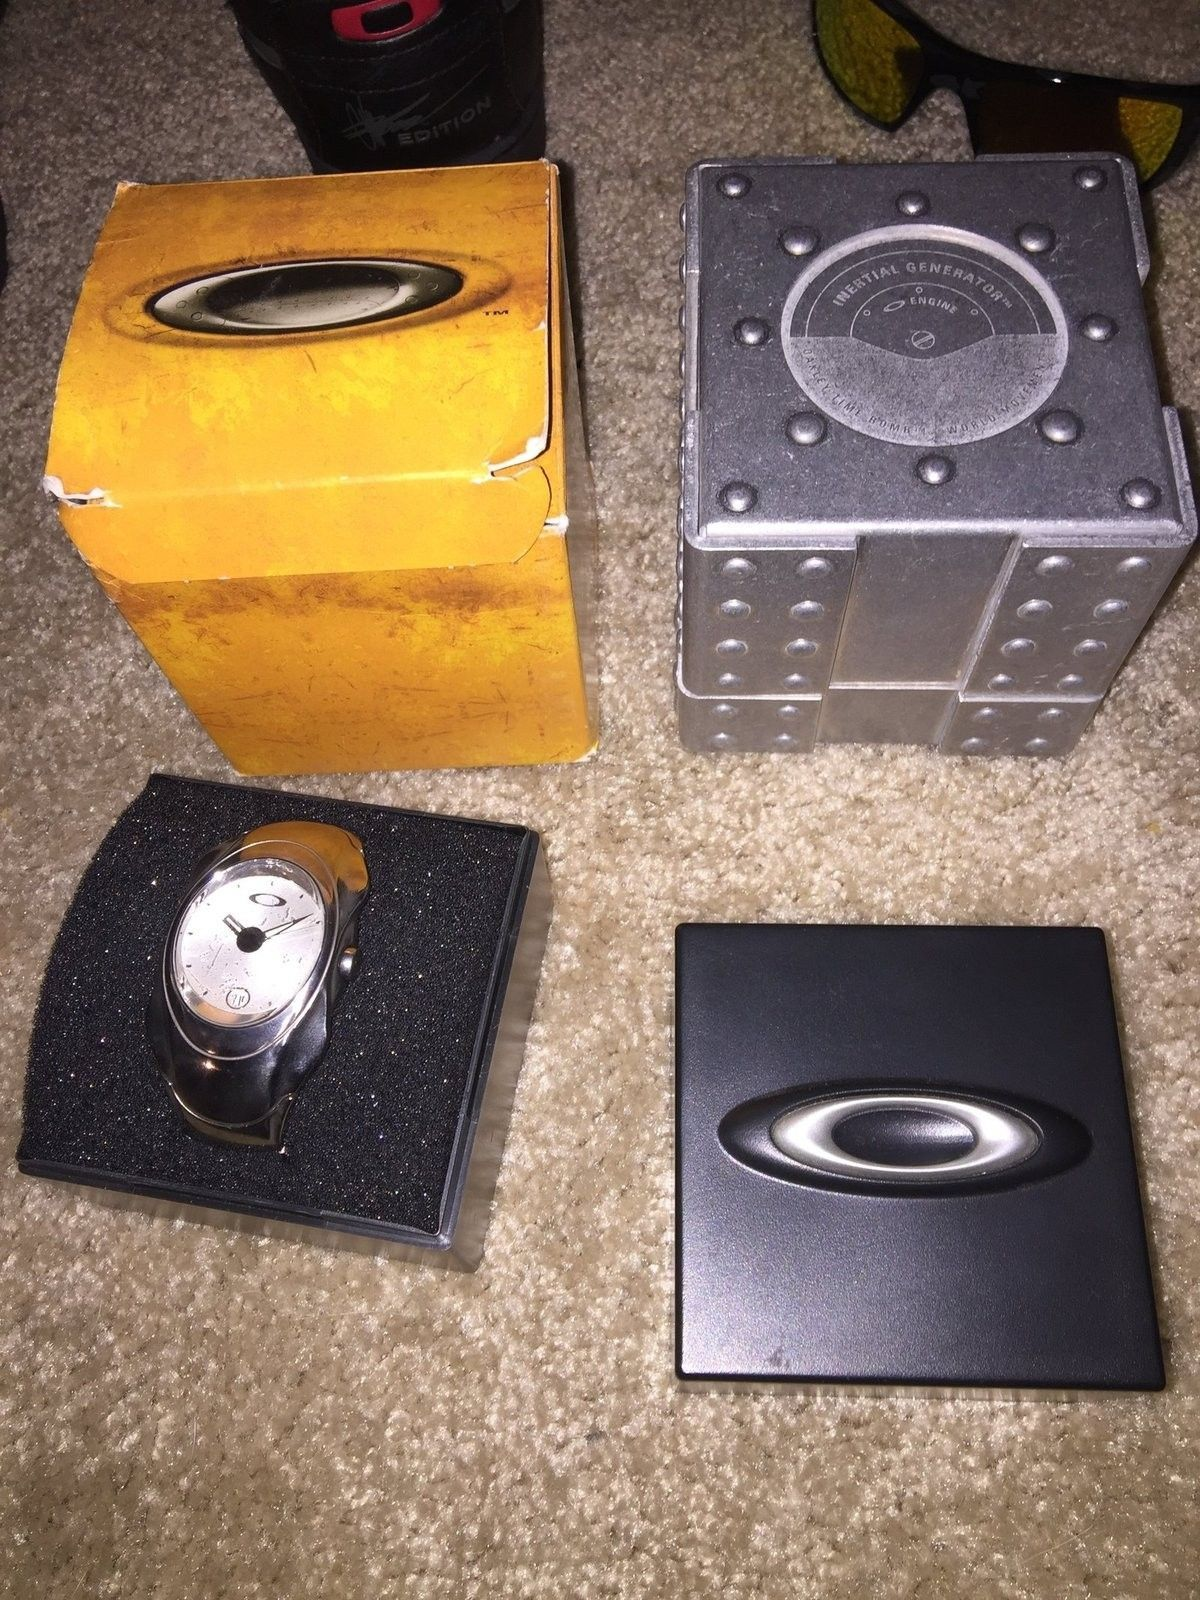 Time bomb w vault $275 - image.jpeg